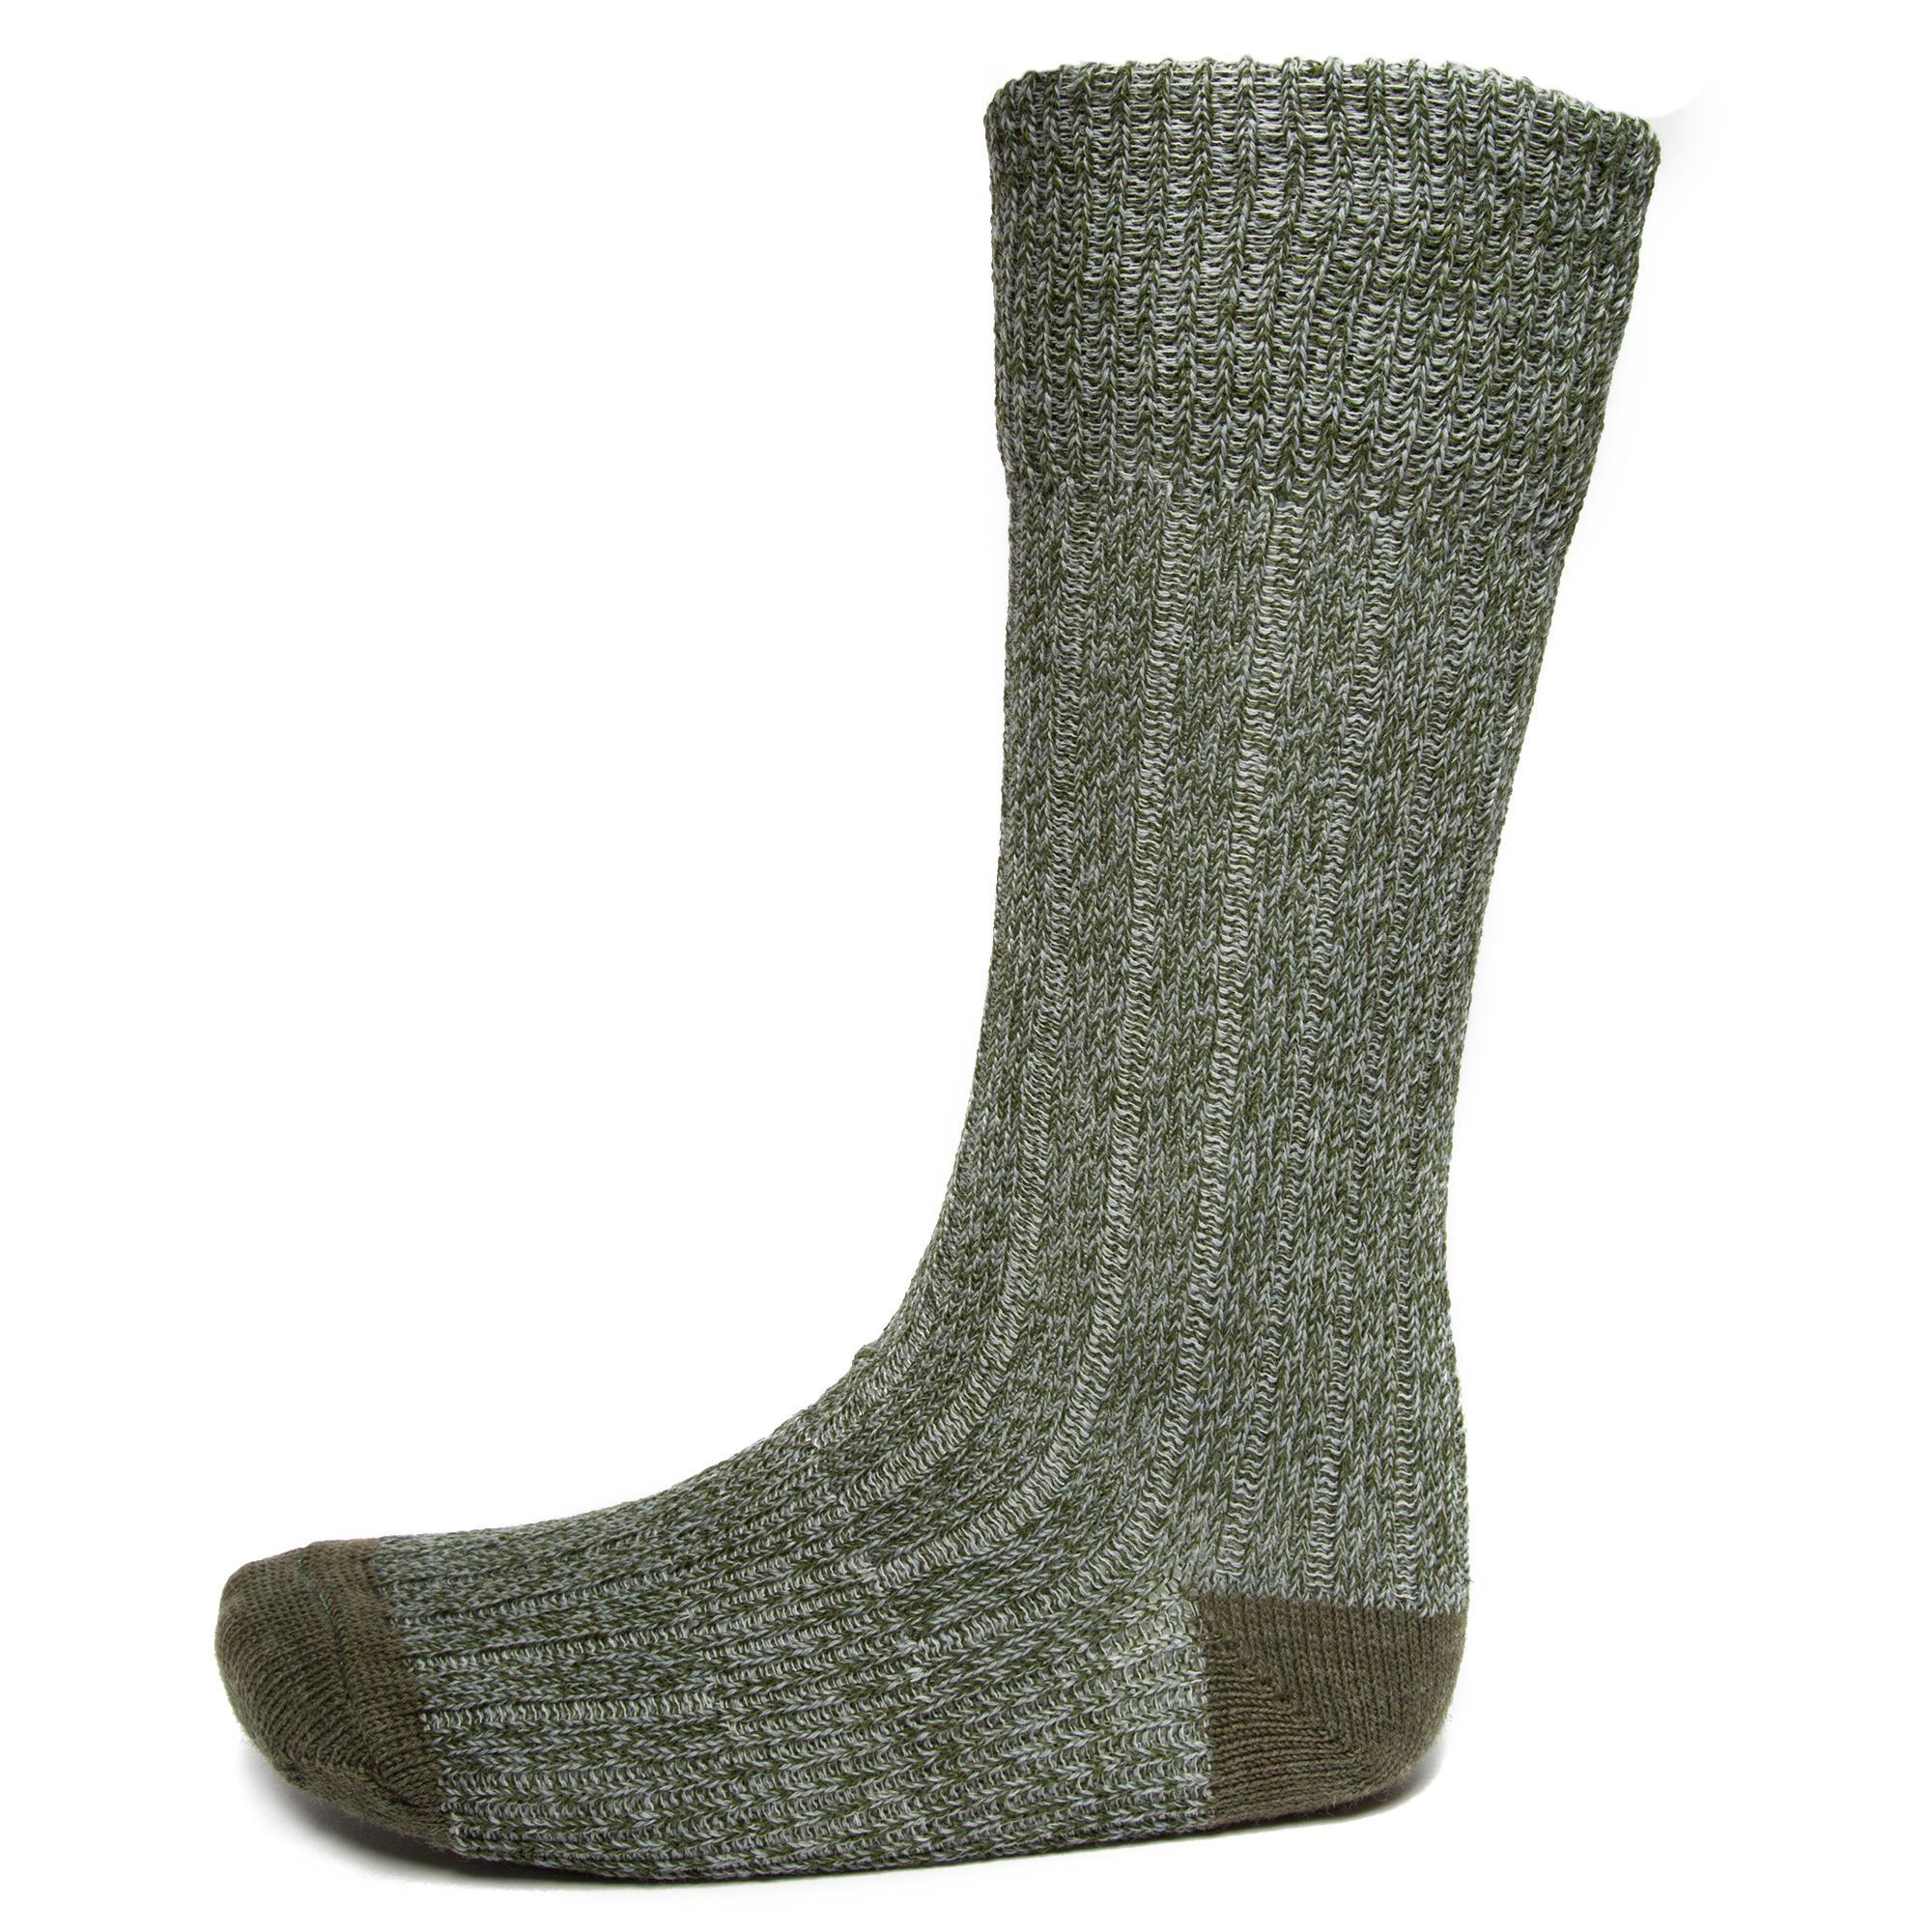 Image of 1000 Mile Men's Ultimate Heavyweight Walking Sock, Green